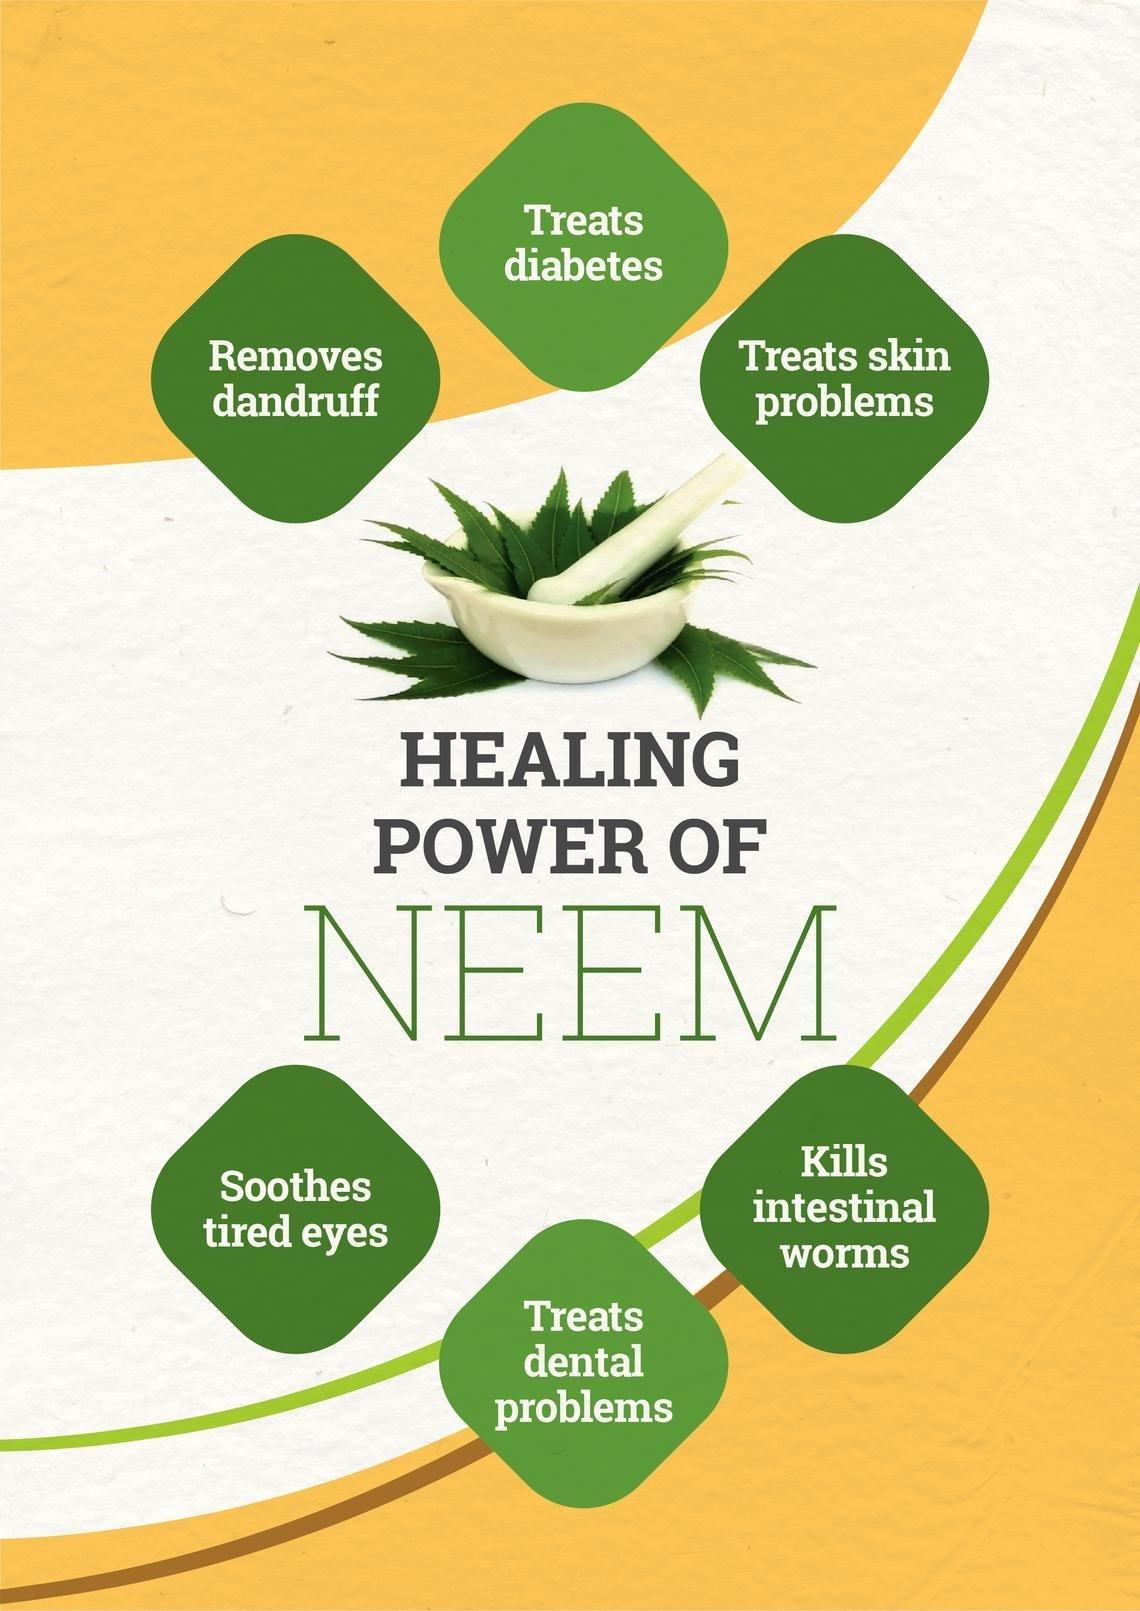 Top 10 Benefits Of Neem Leaves